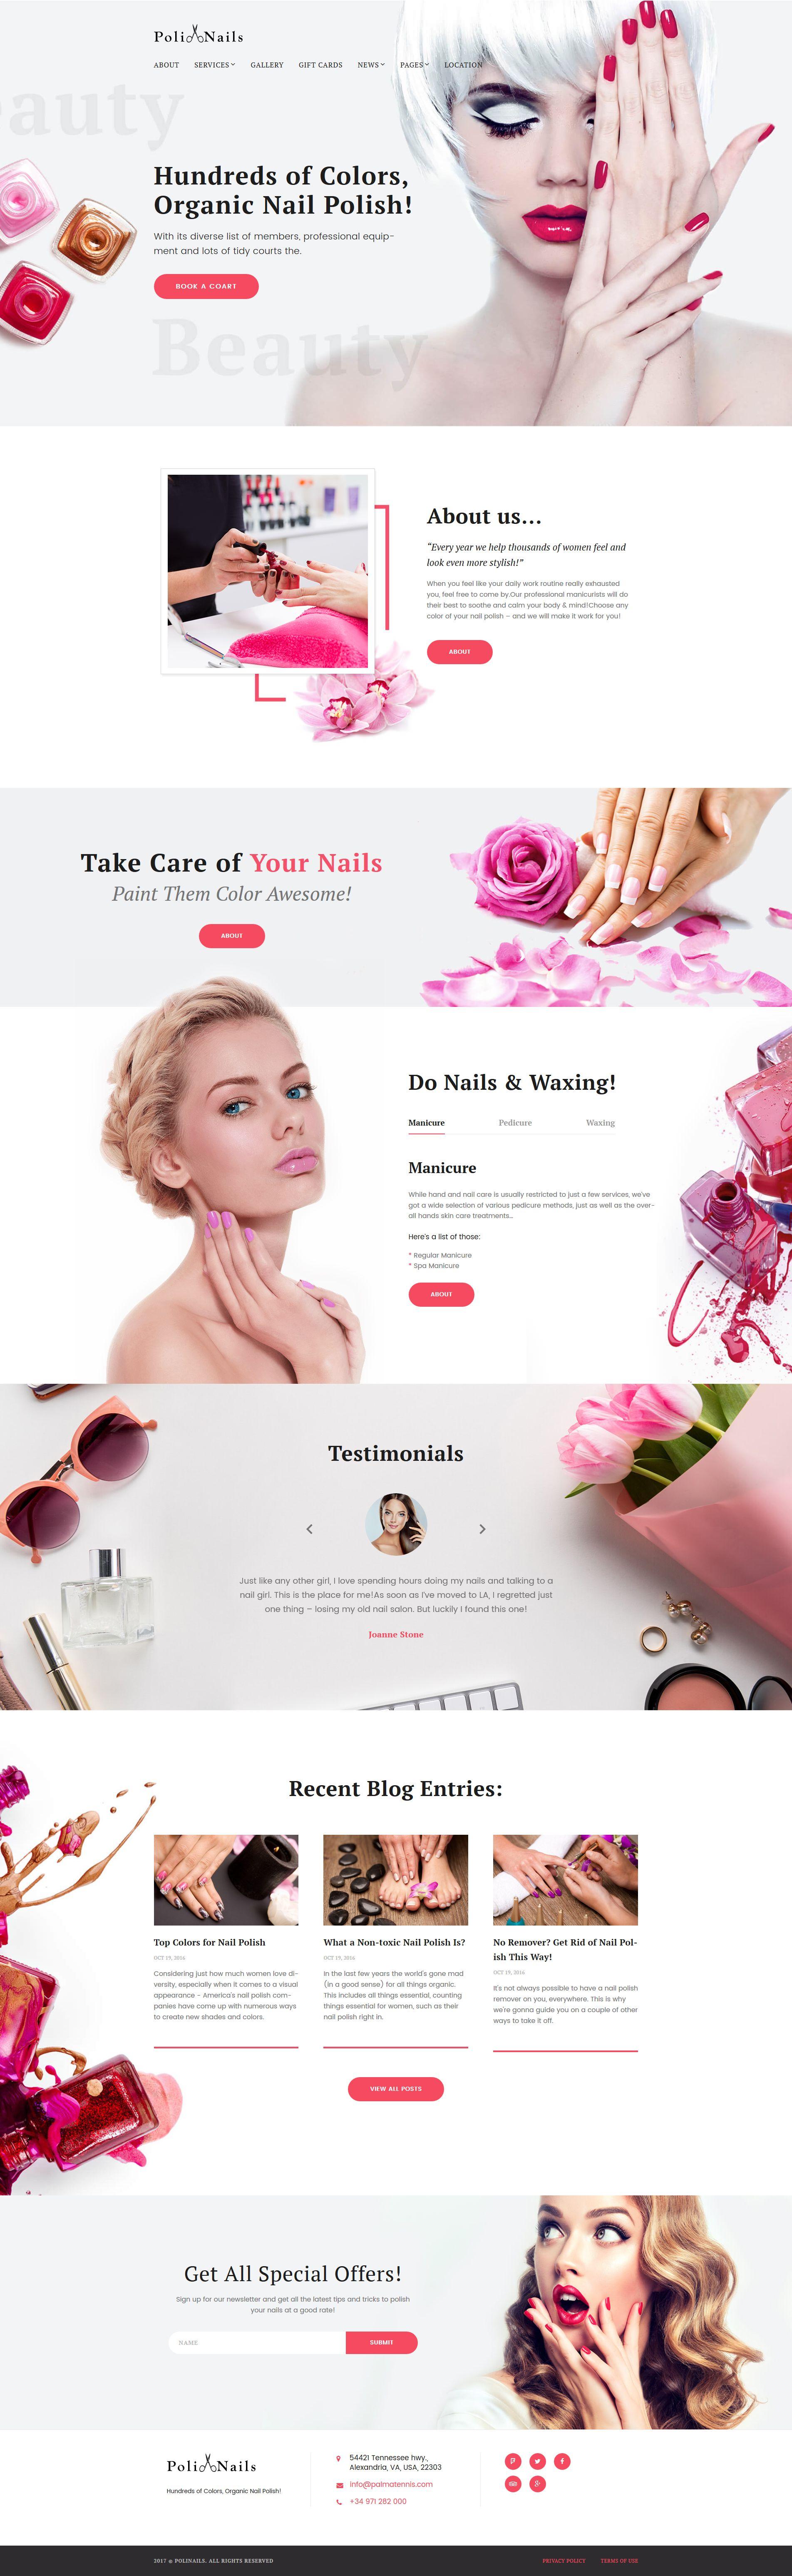 PoliNails Nail Salon WordPress Theme Веб Pinterest